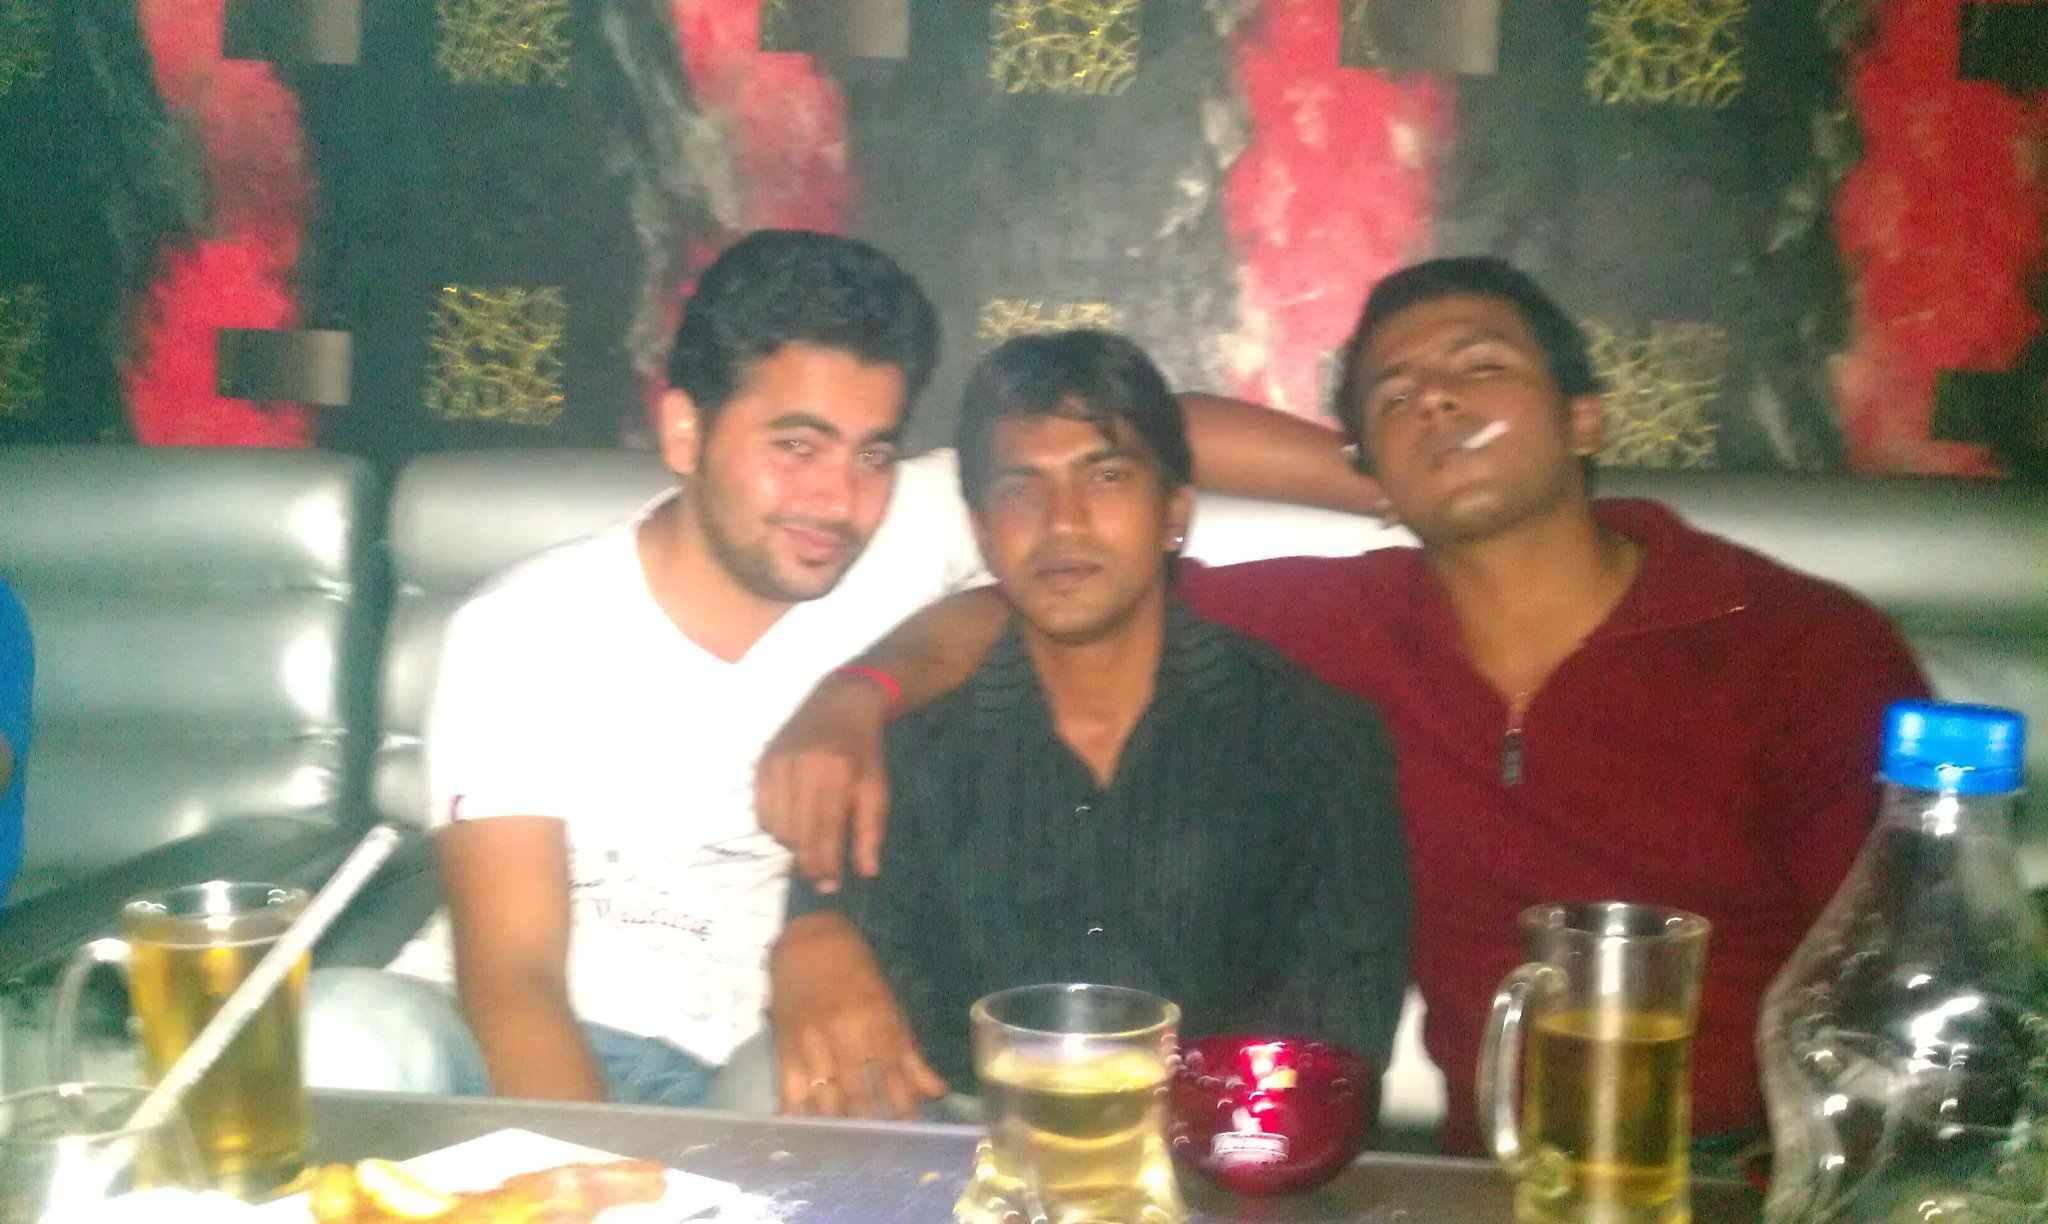 Arjun Gowda drinking alcohol